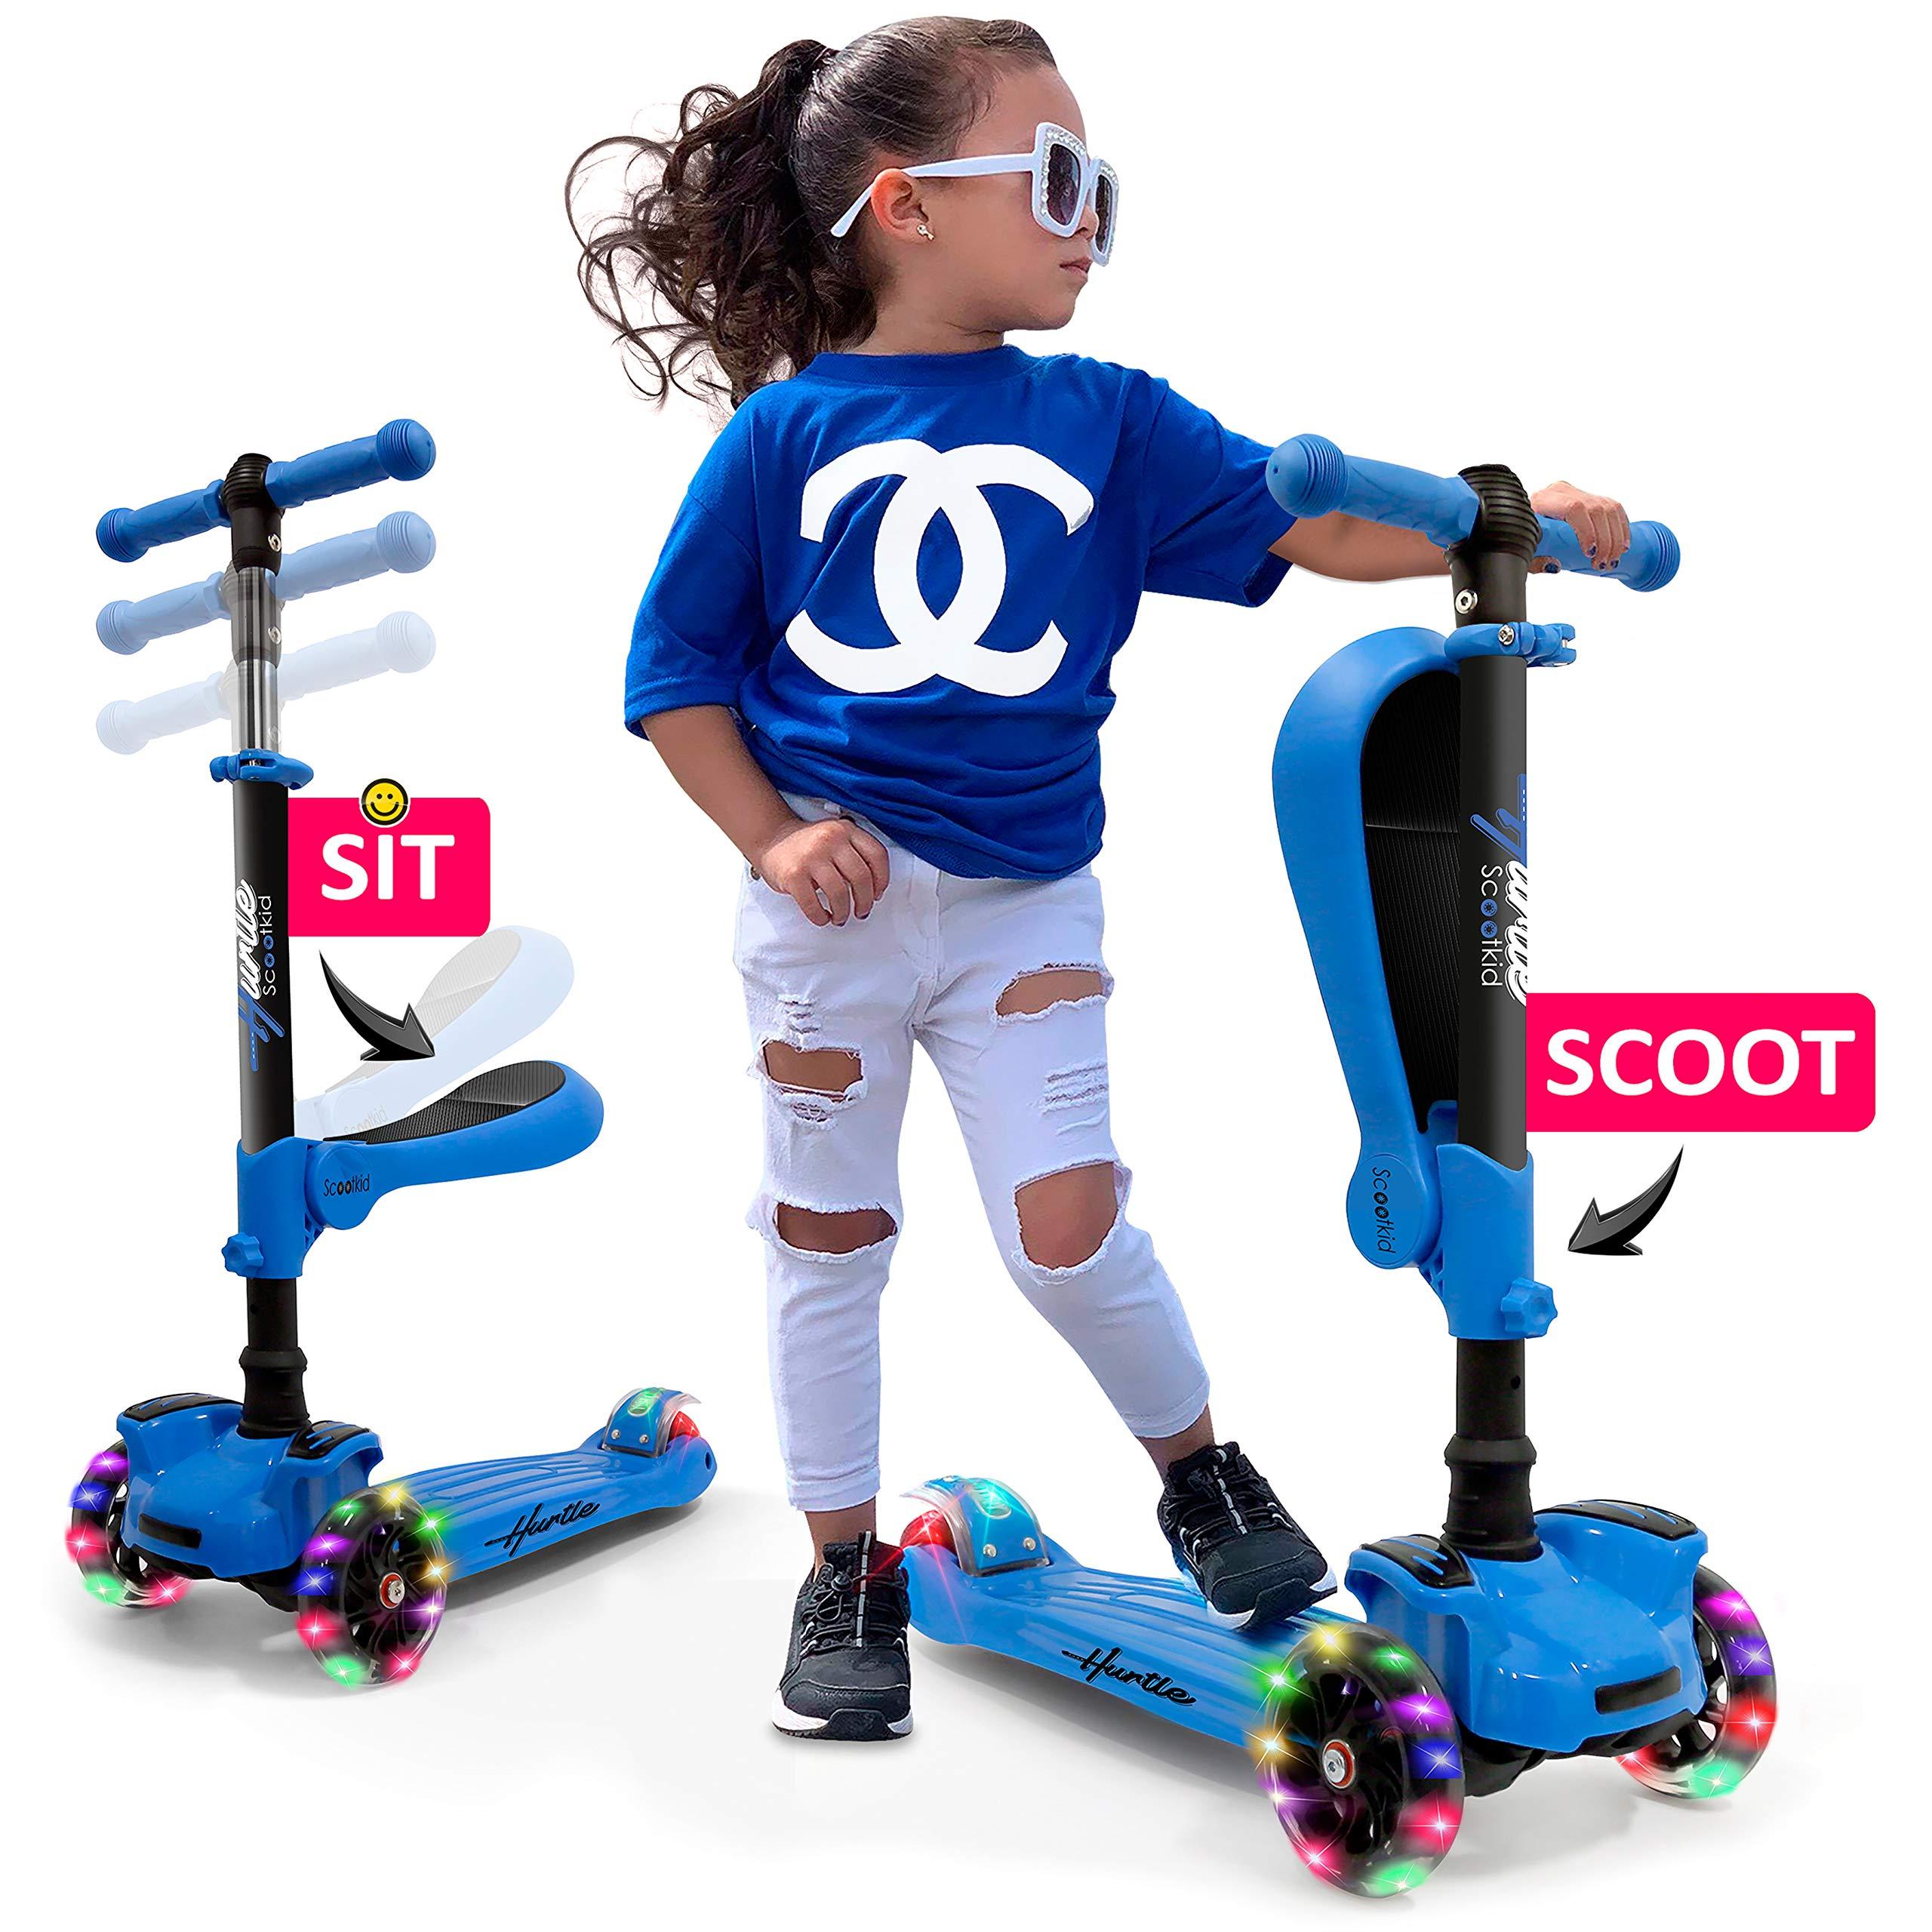 Hurtle 3 Wheeled Scooter Lean Steer